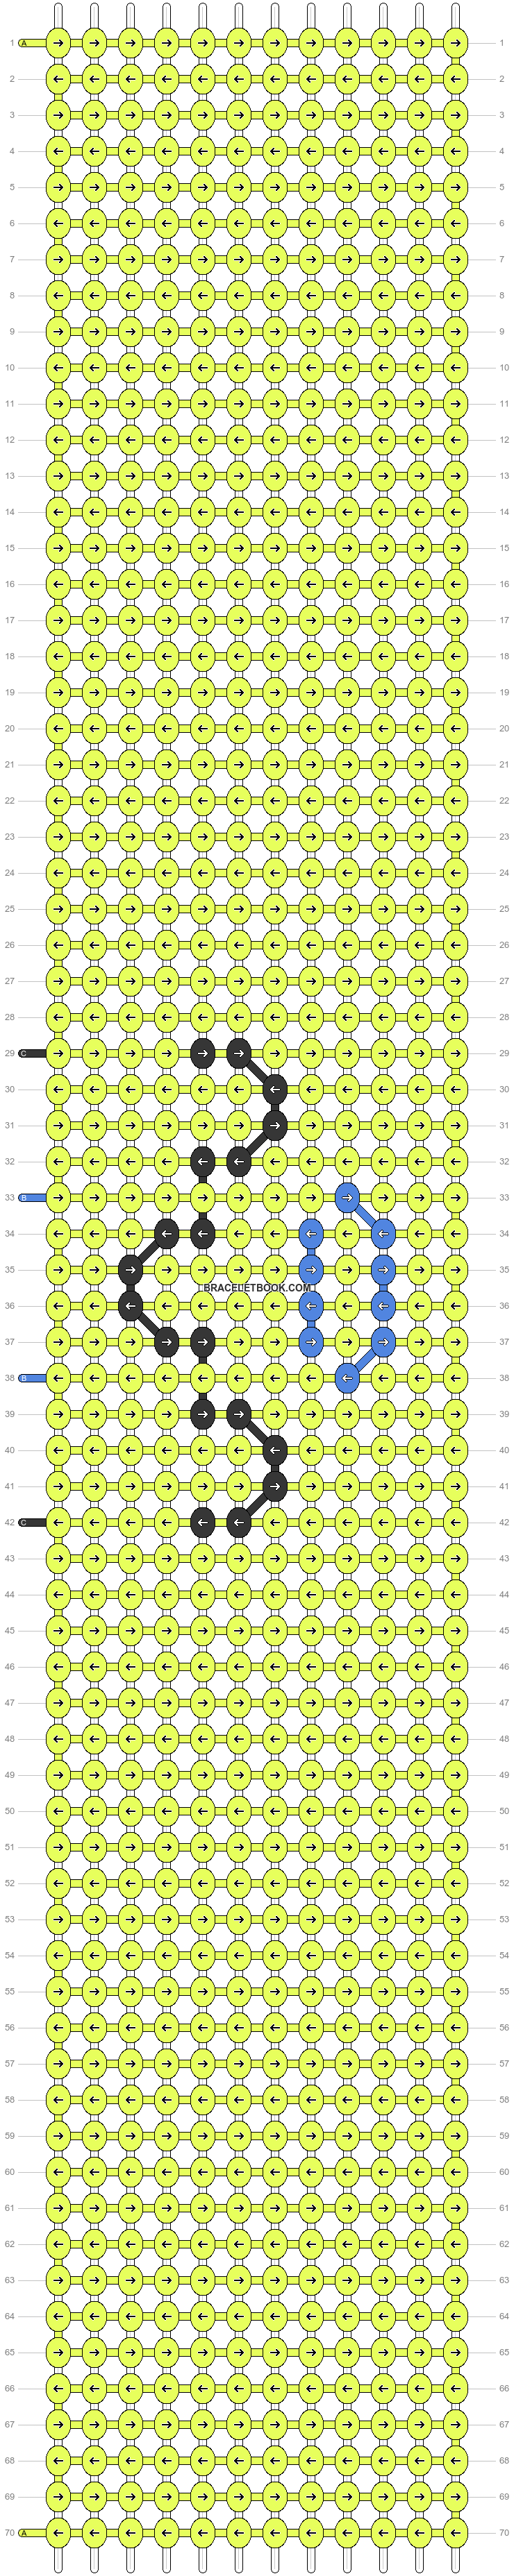 Alpha pattern #47915 pattern